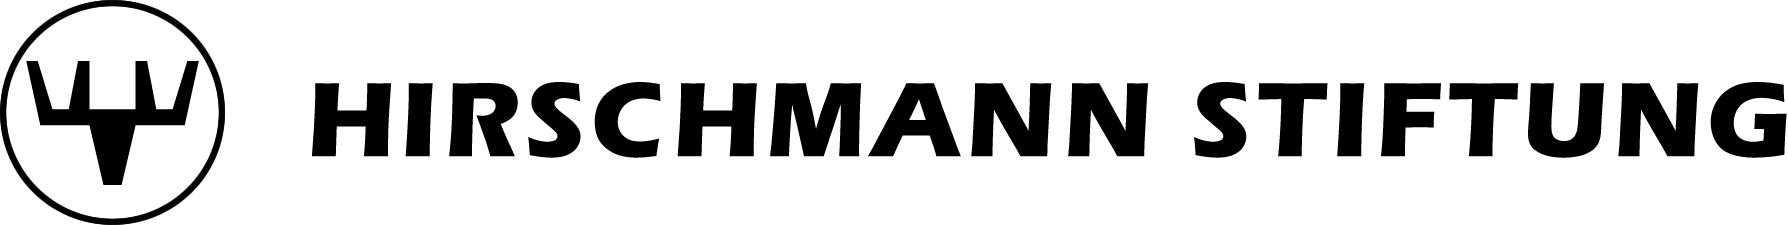 Hirschmann Stiftung